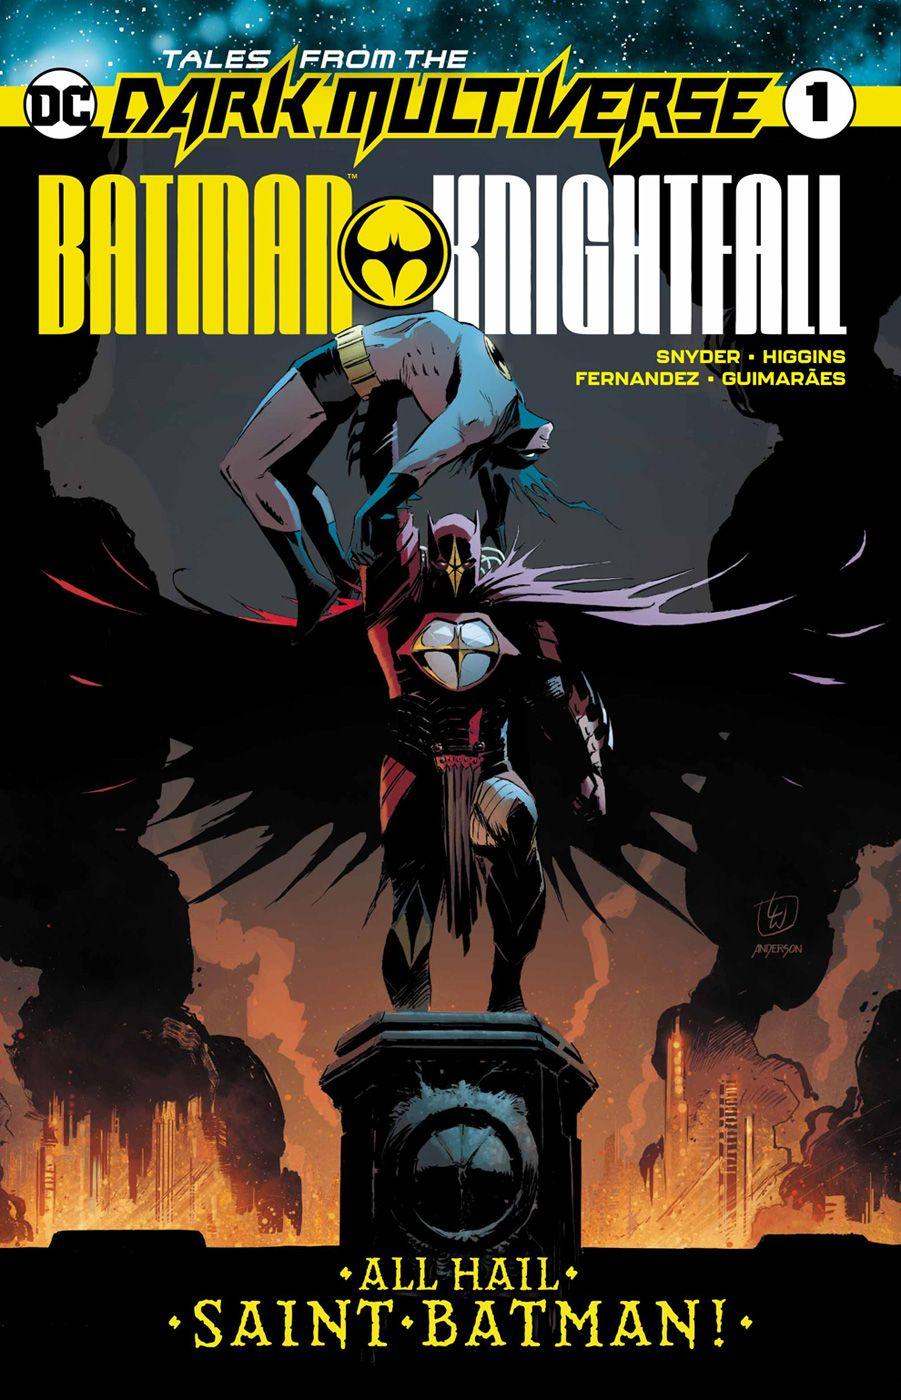 ALL HAIL SAINT BATMAN! Thirty years after Bruce Wayne